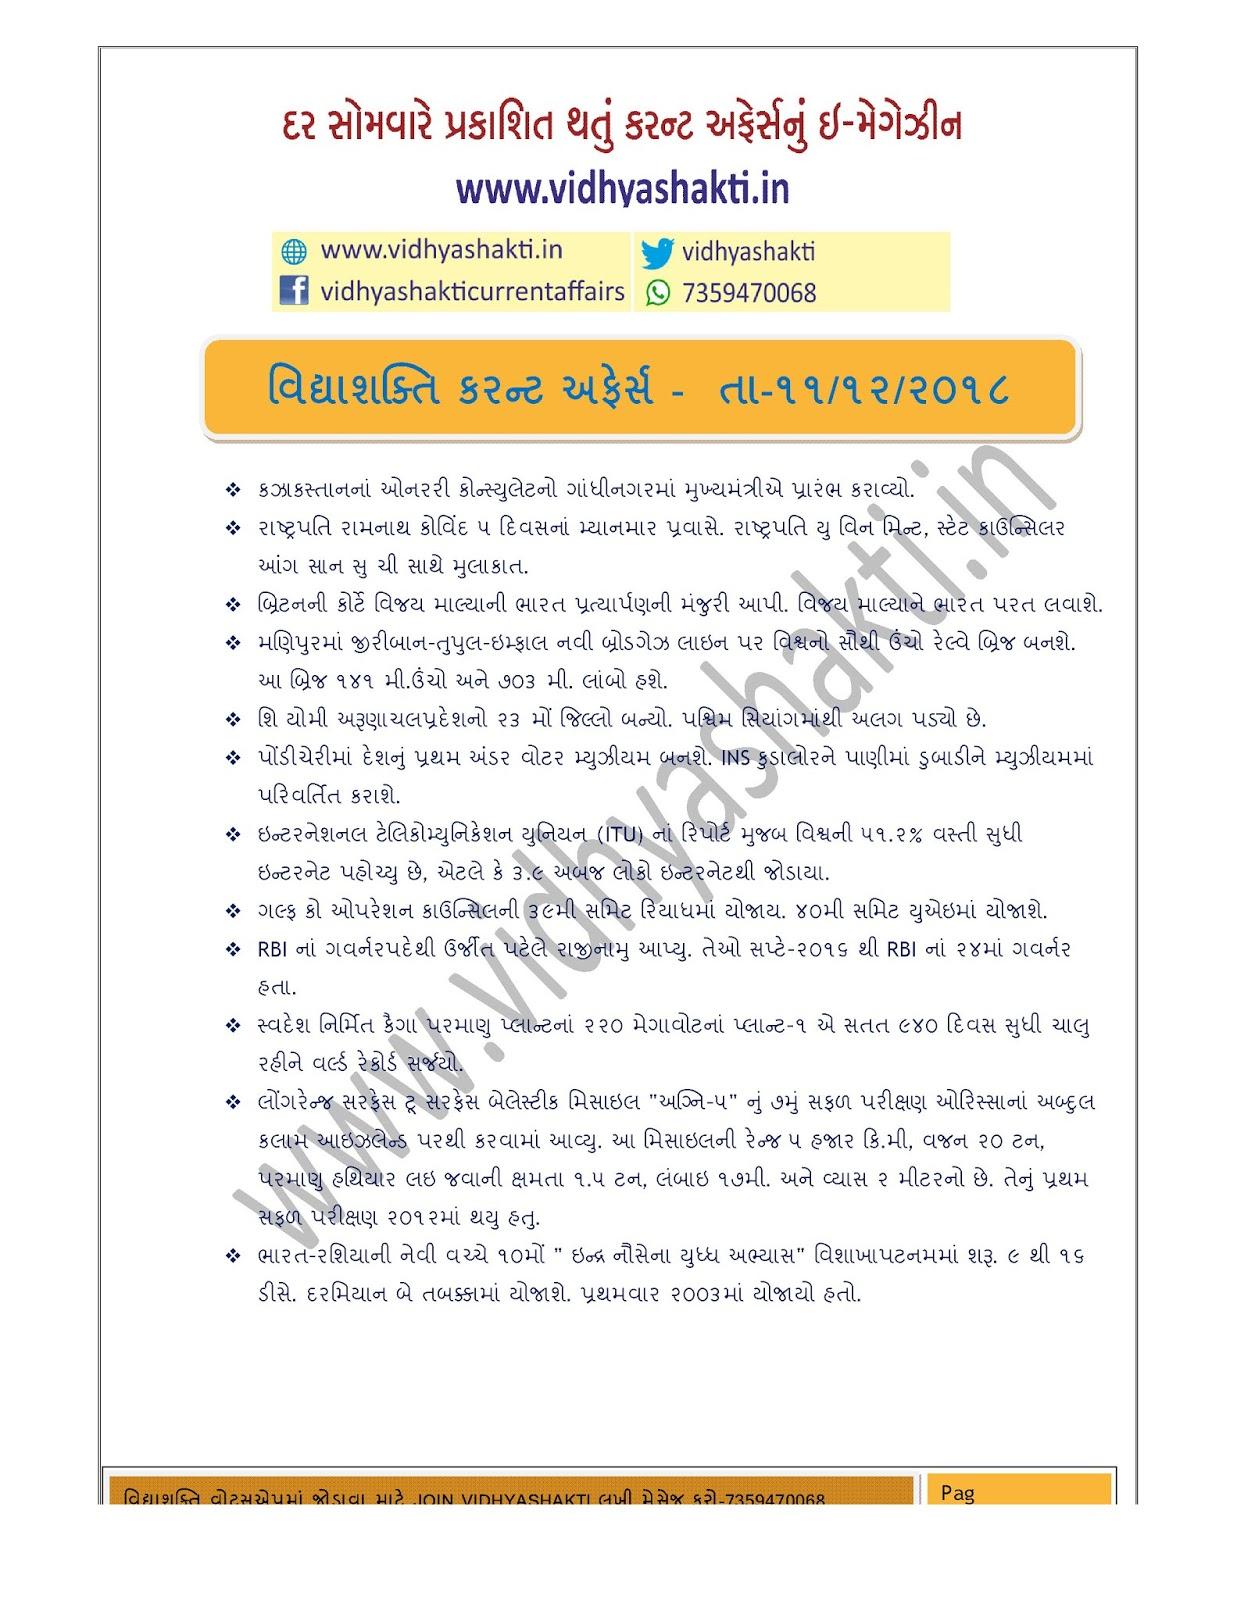 Daily Gujarati Current Affairs 11 Dec-2018 Vidhyashakti